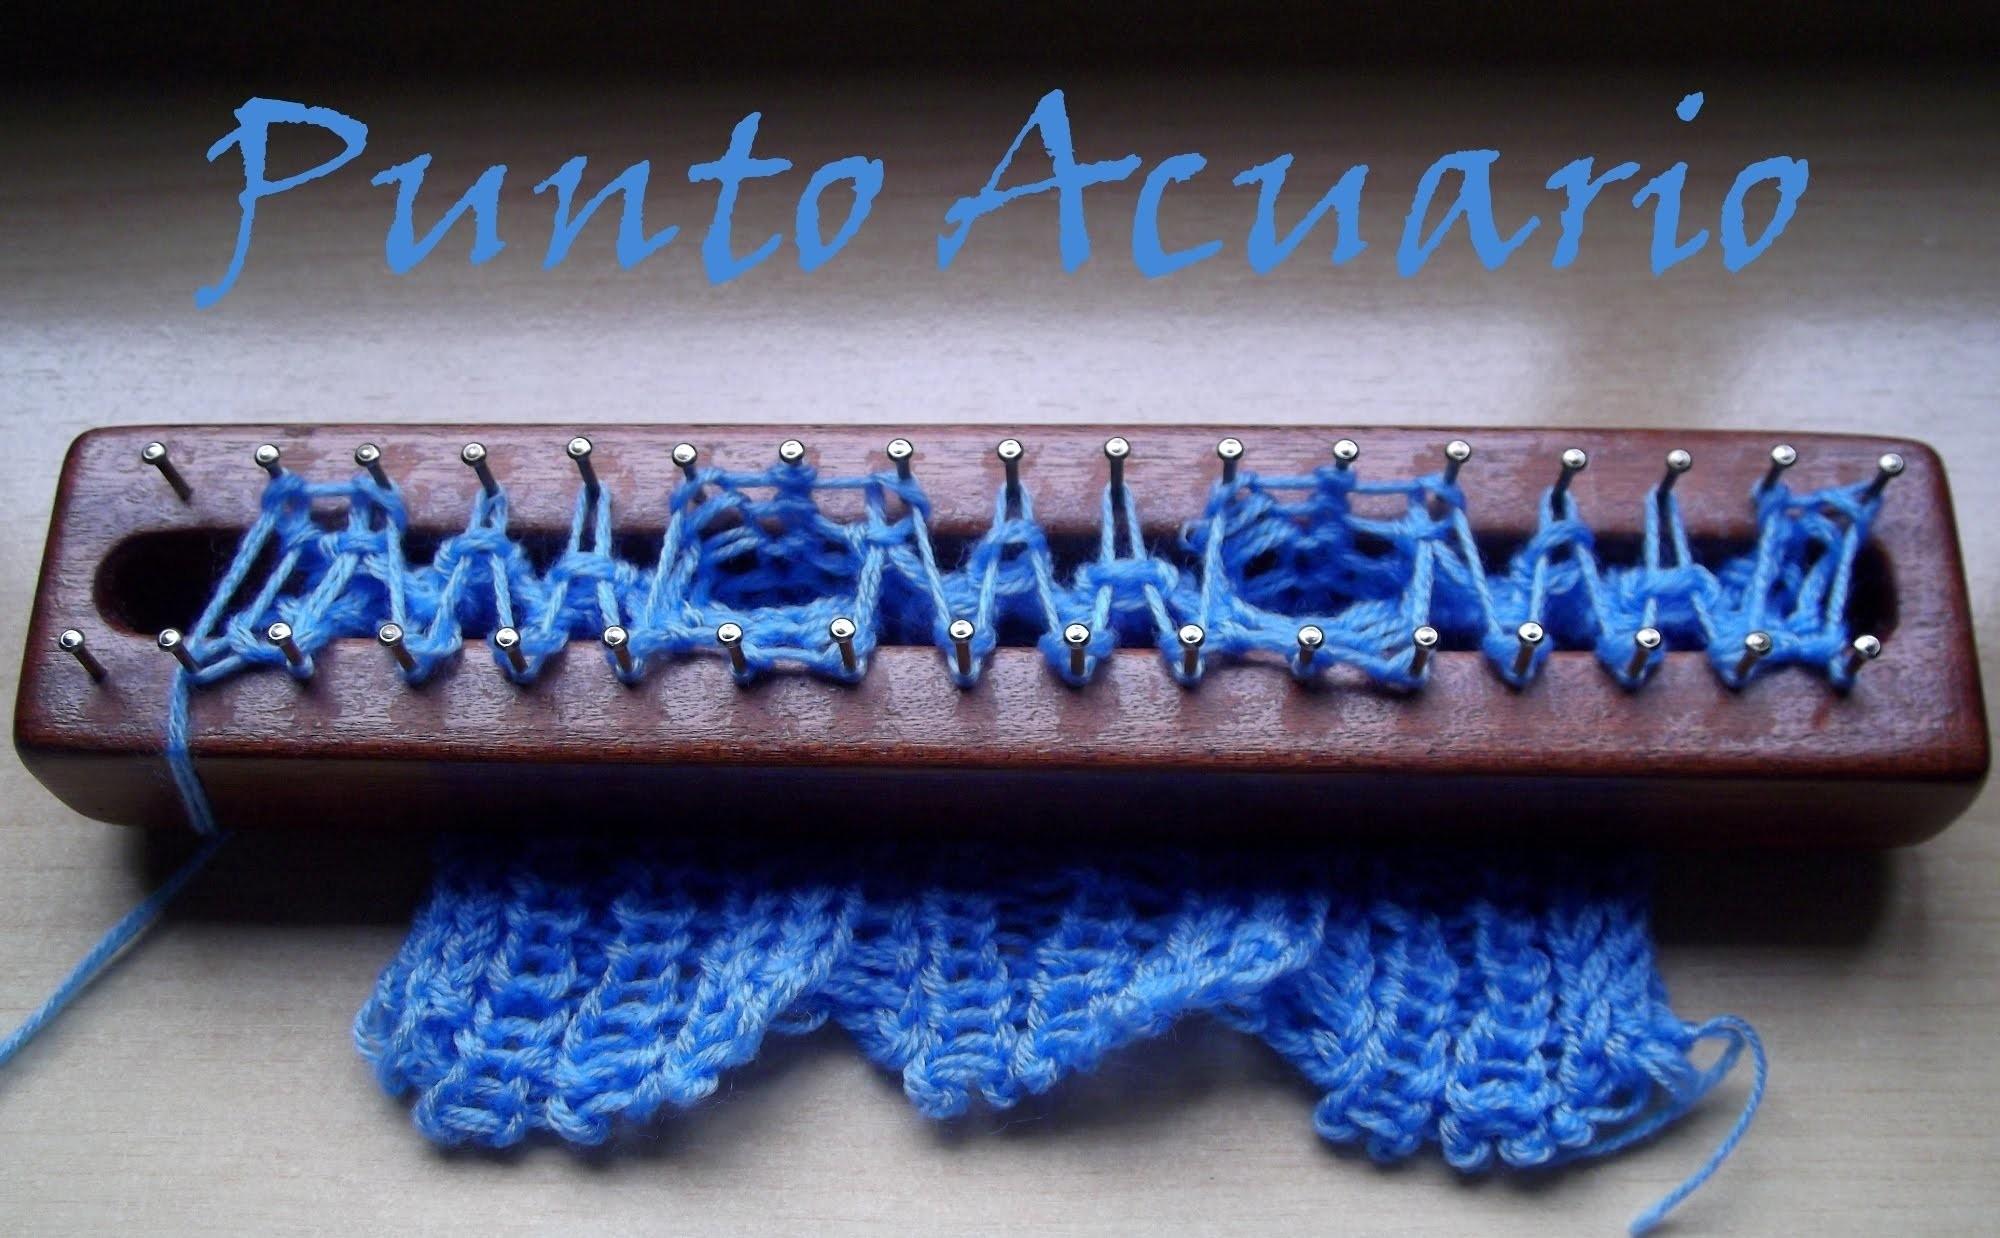 Punto Acuario en Telar Maya. Aquarius stitch on loom